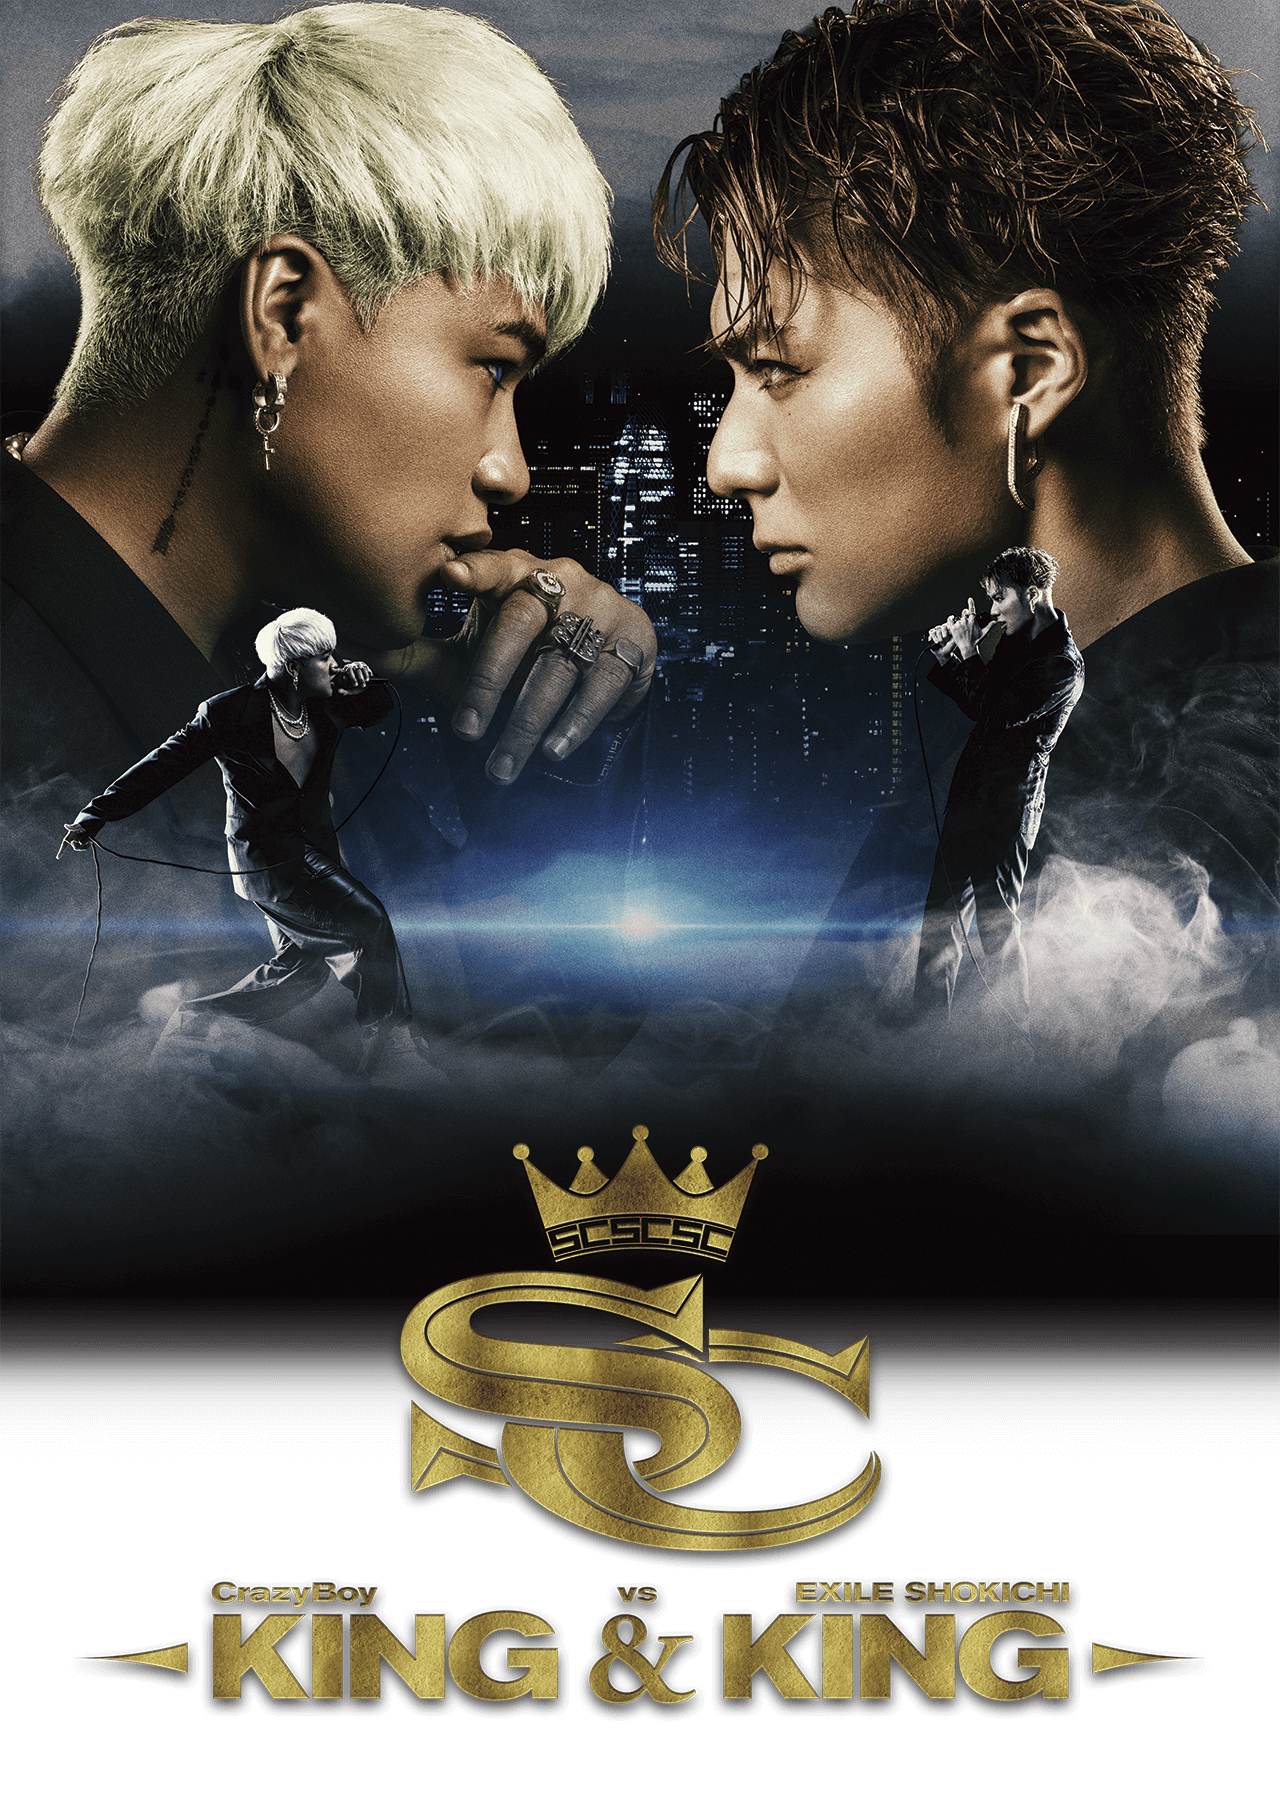 KING & KINGポスター画像